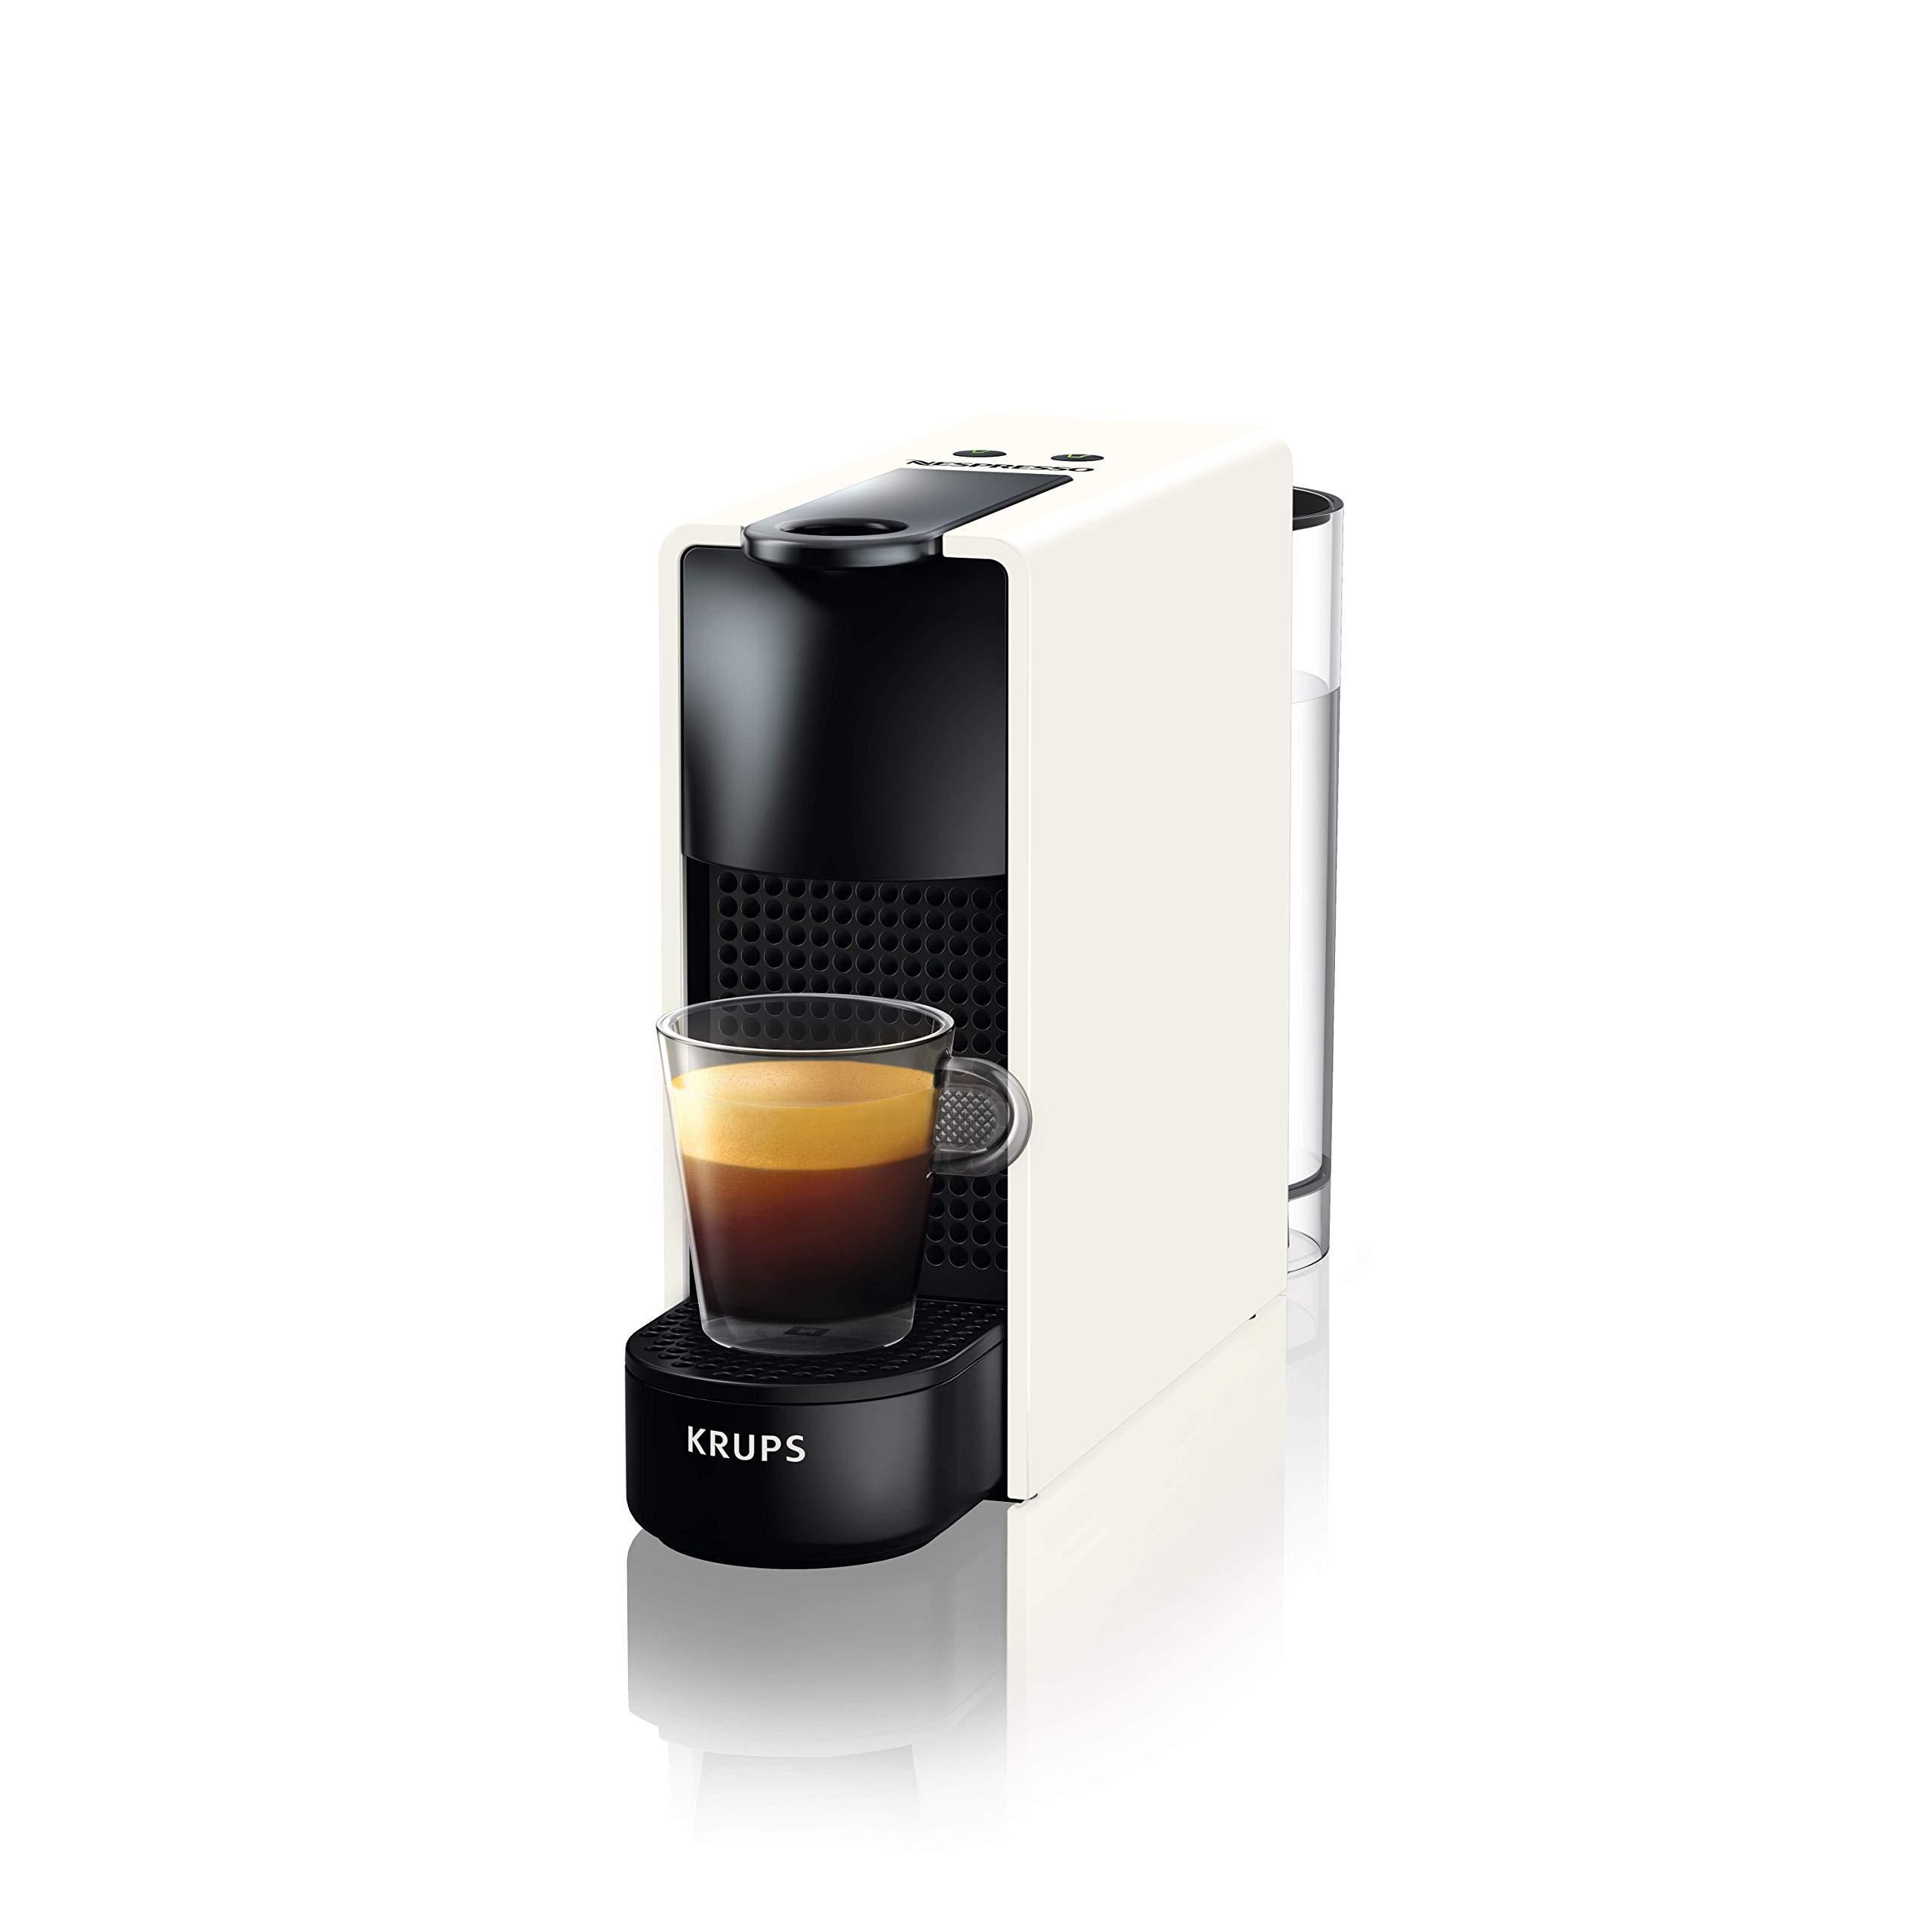 Krups Nespresso Essenza Mini Cafetera, 1450 W, 0.6 litros, Blanco product image